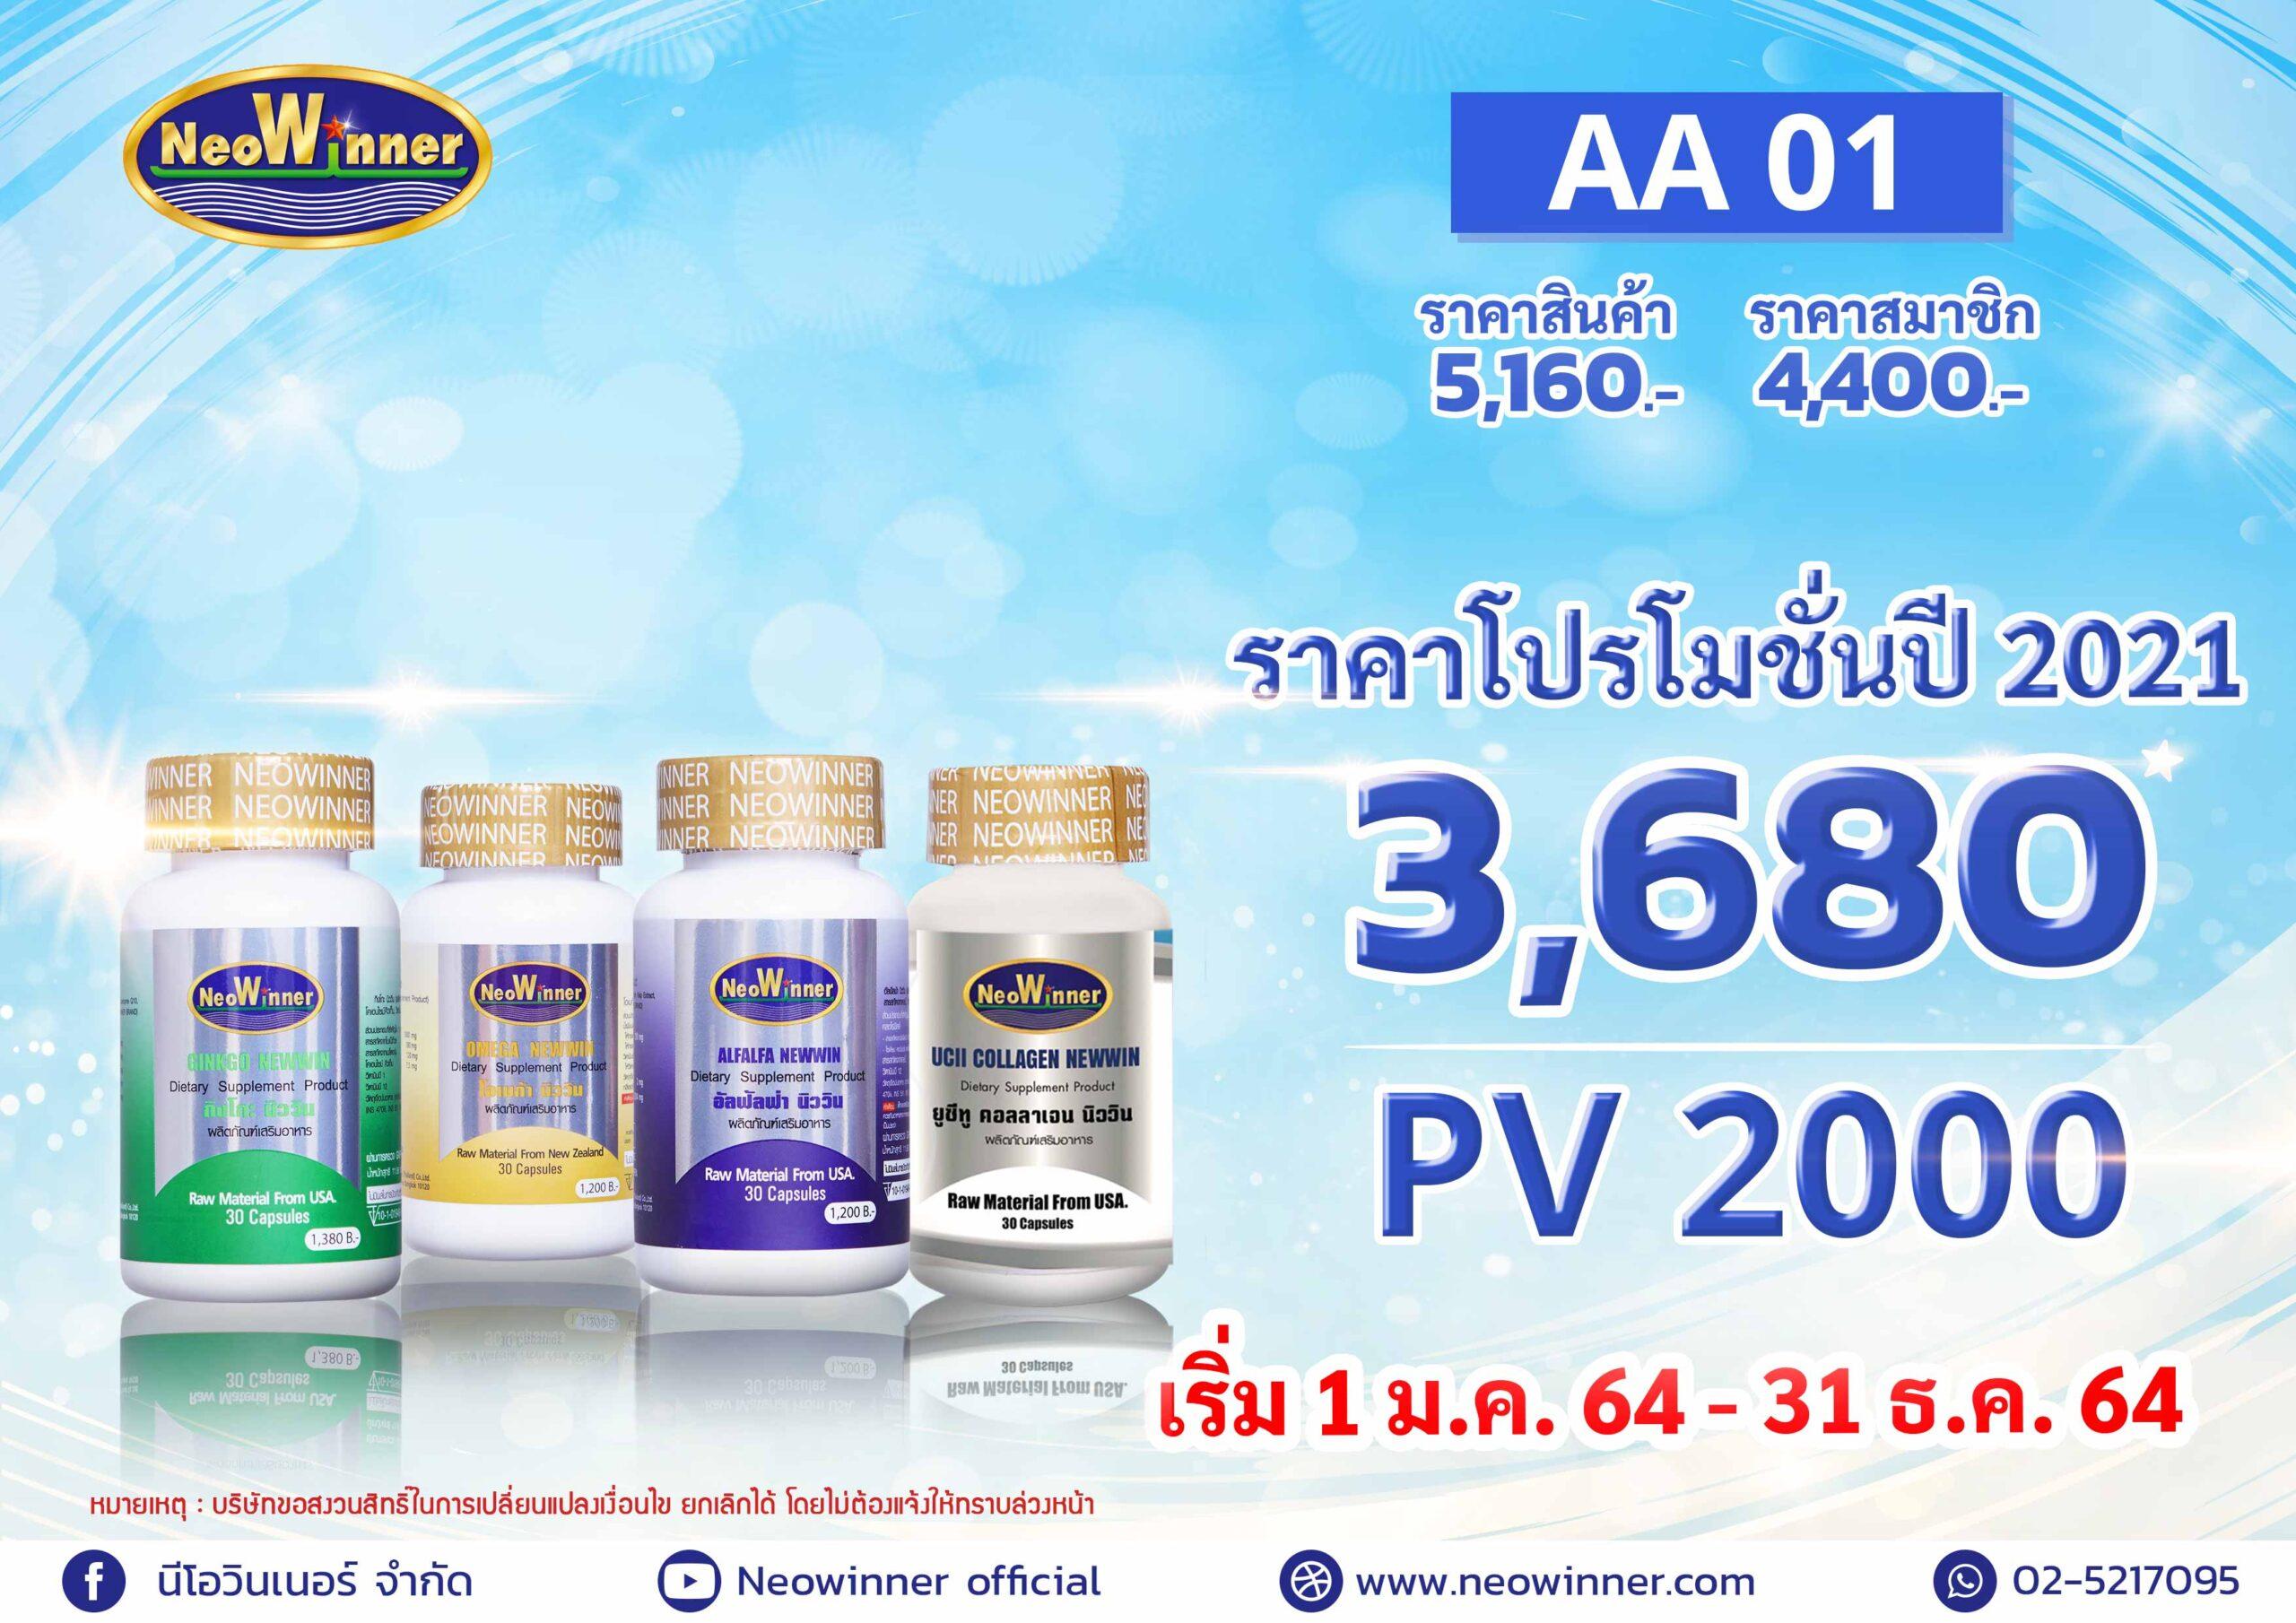 AA-01-2020